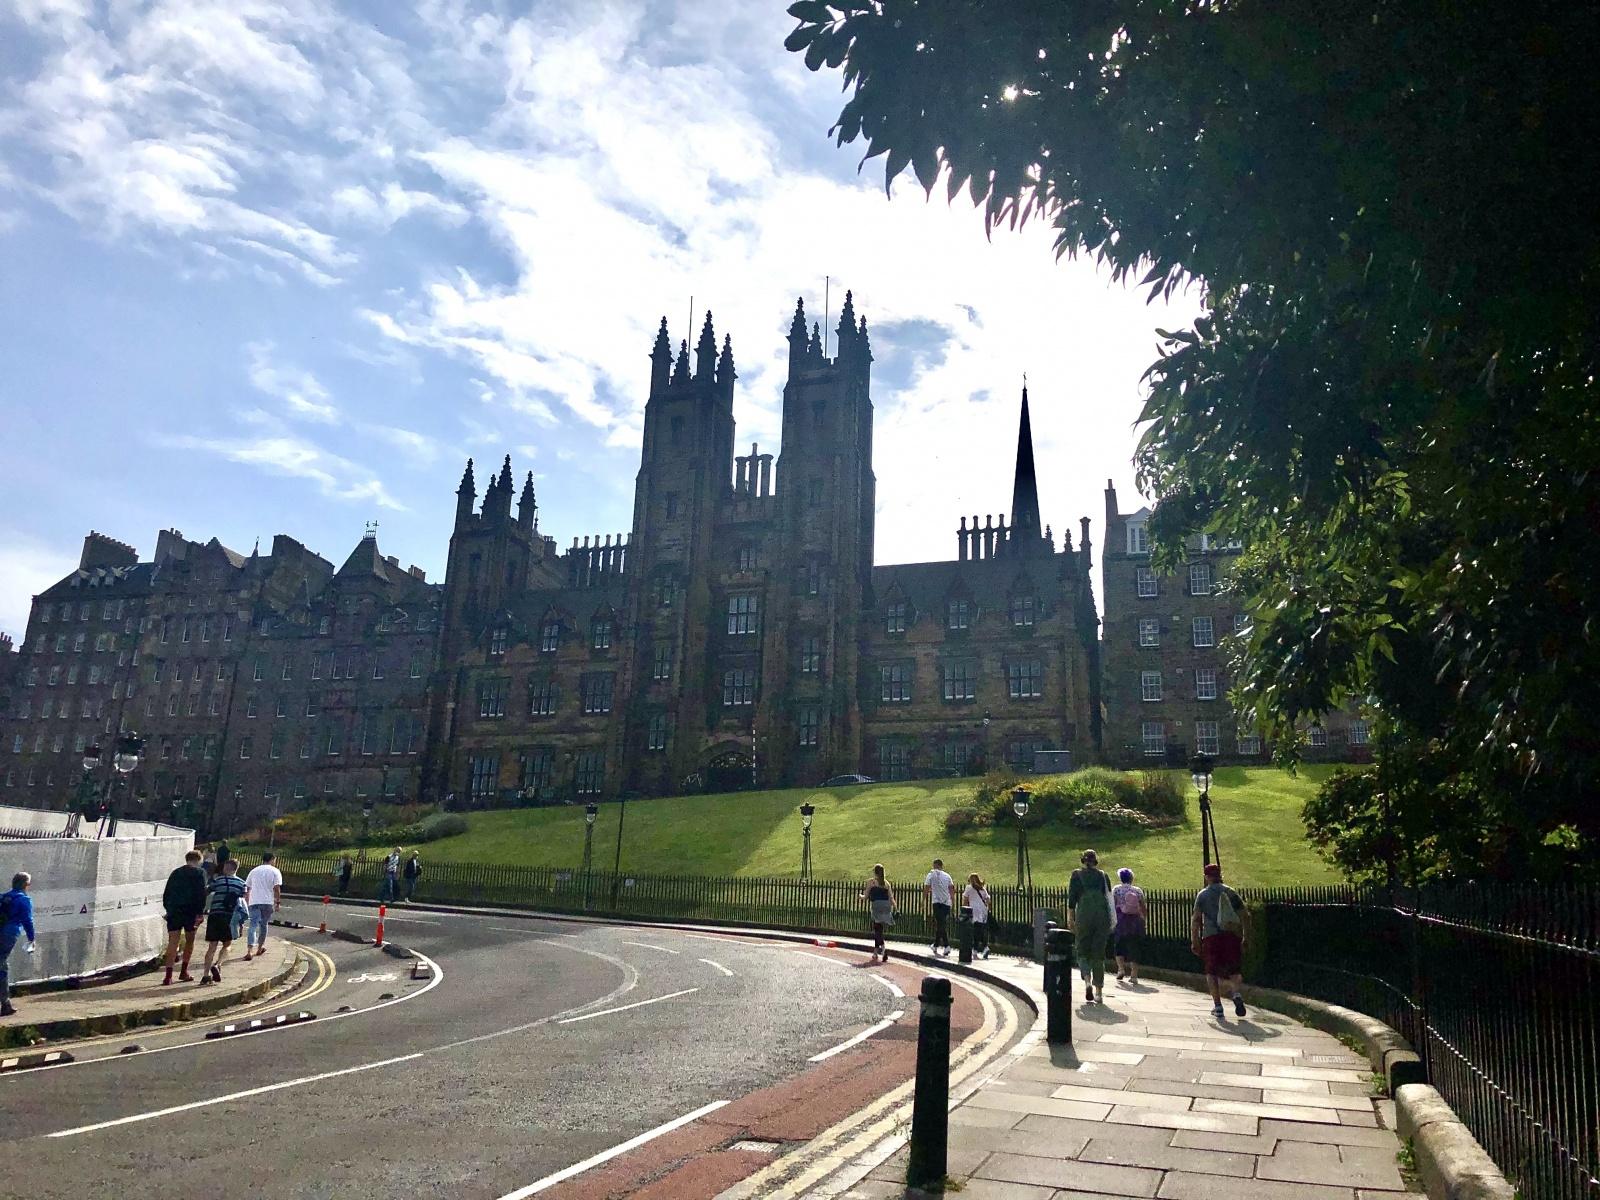 New College, The University of Edinburgh